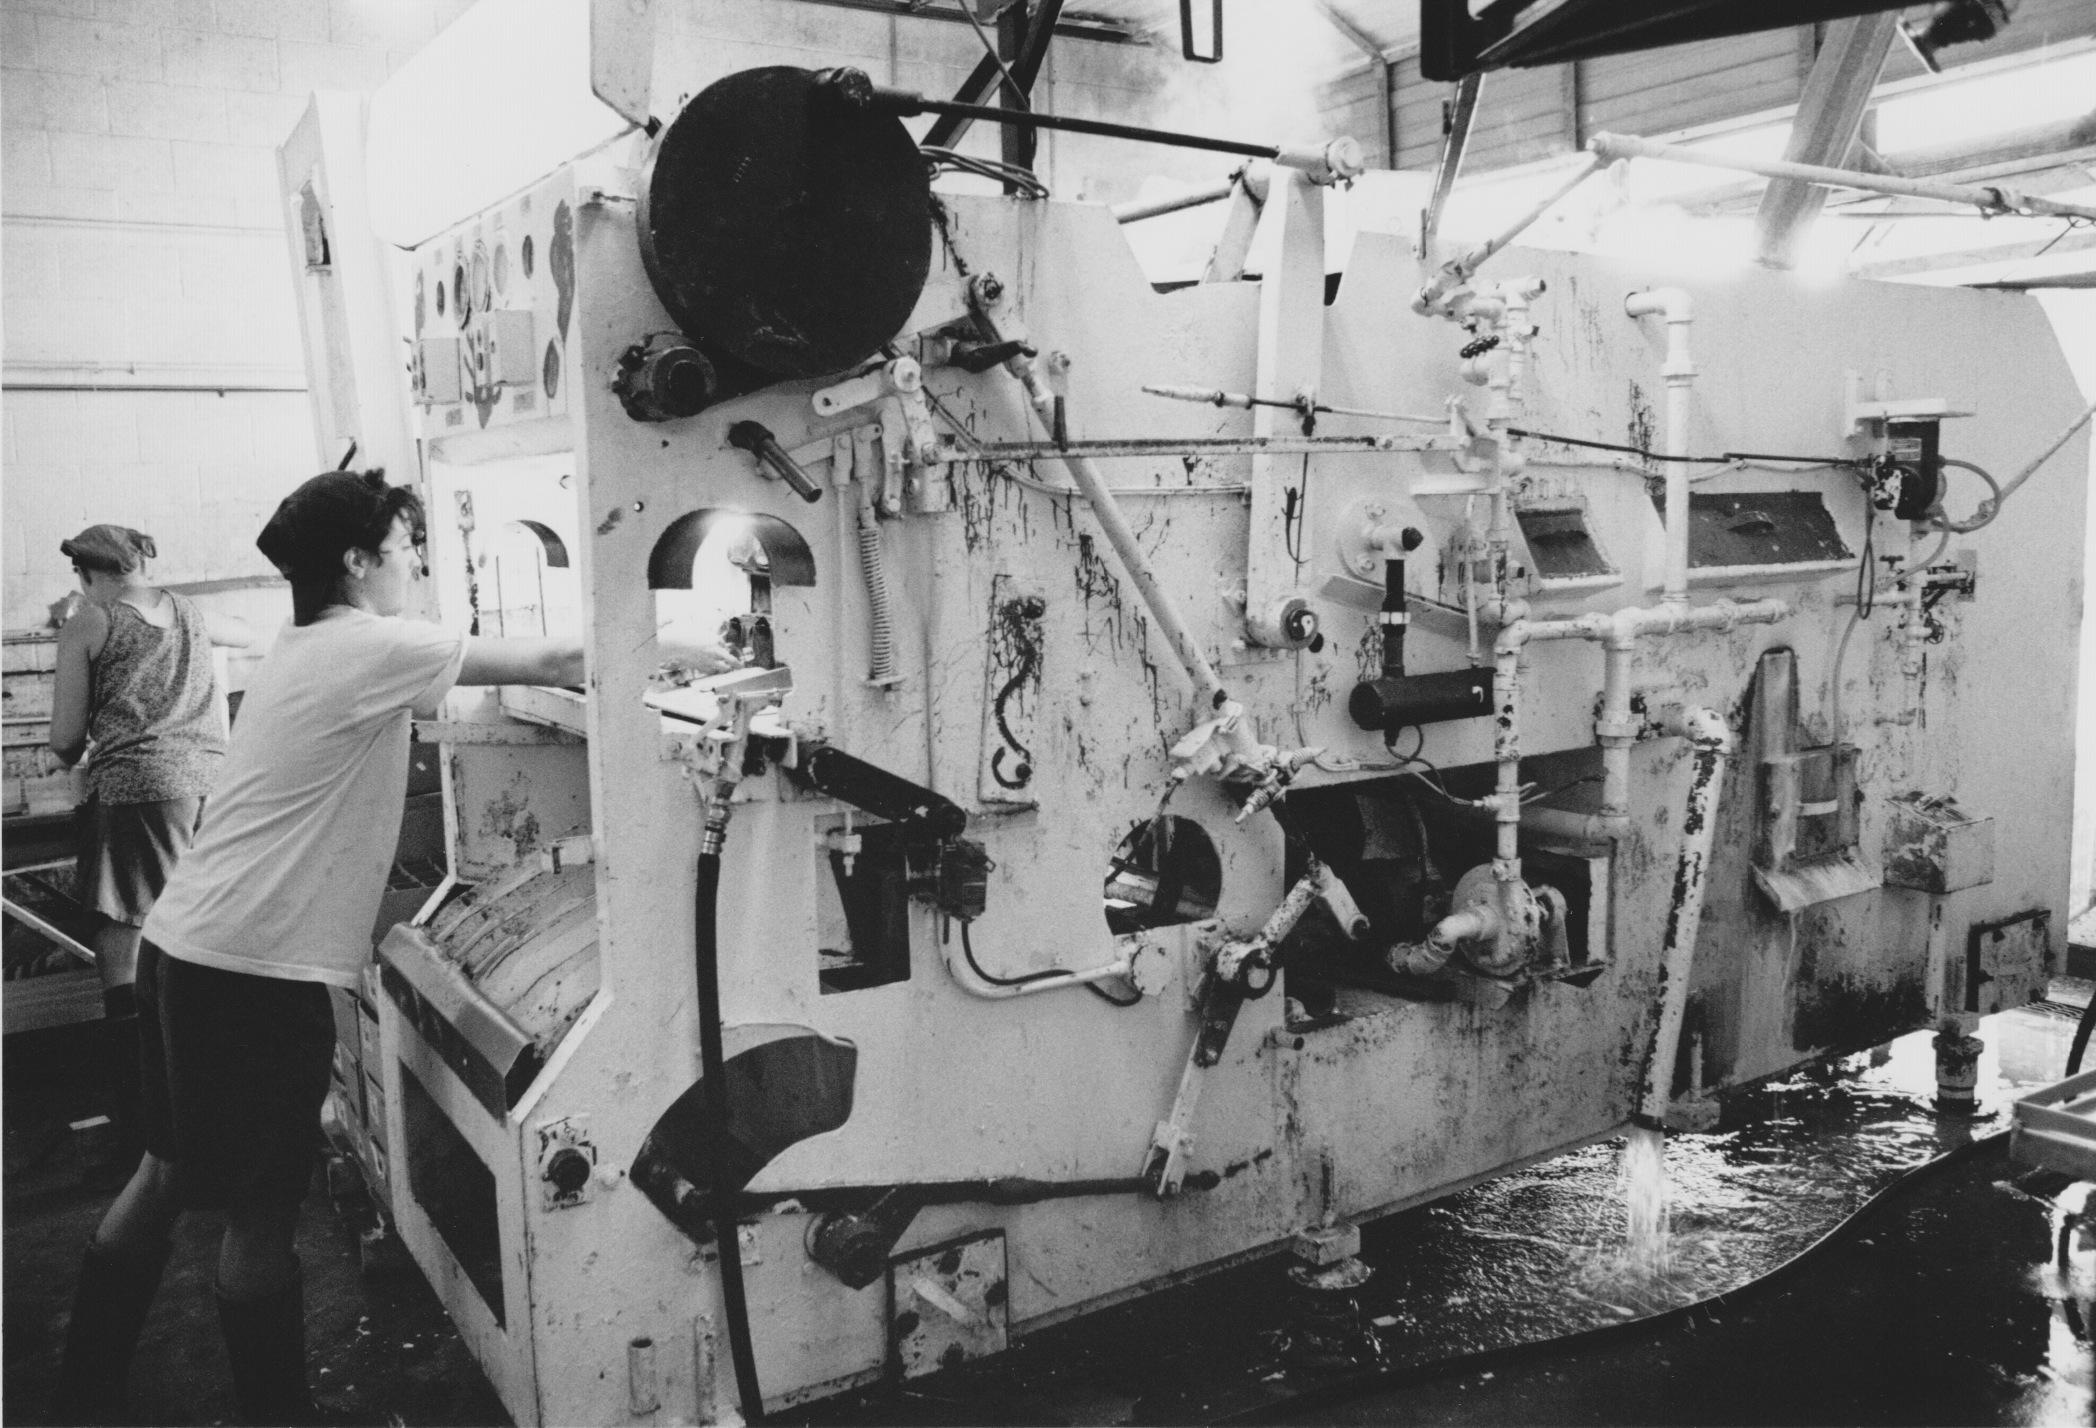 Bottle-washing at the original Genesis Juice cooperative, beginning with the old glass sterilizing machine, Big Bertha. Photo credit to  Rain Magazine